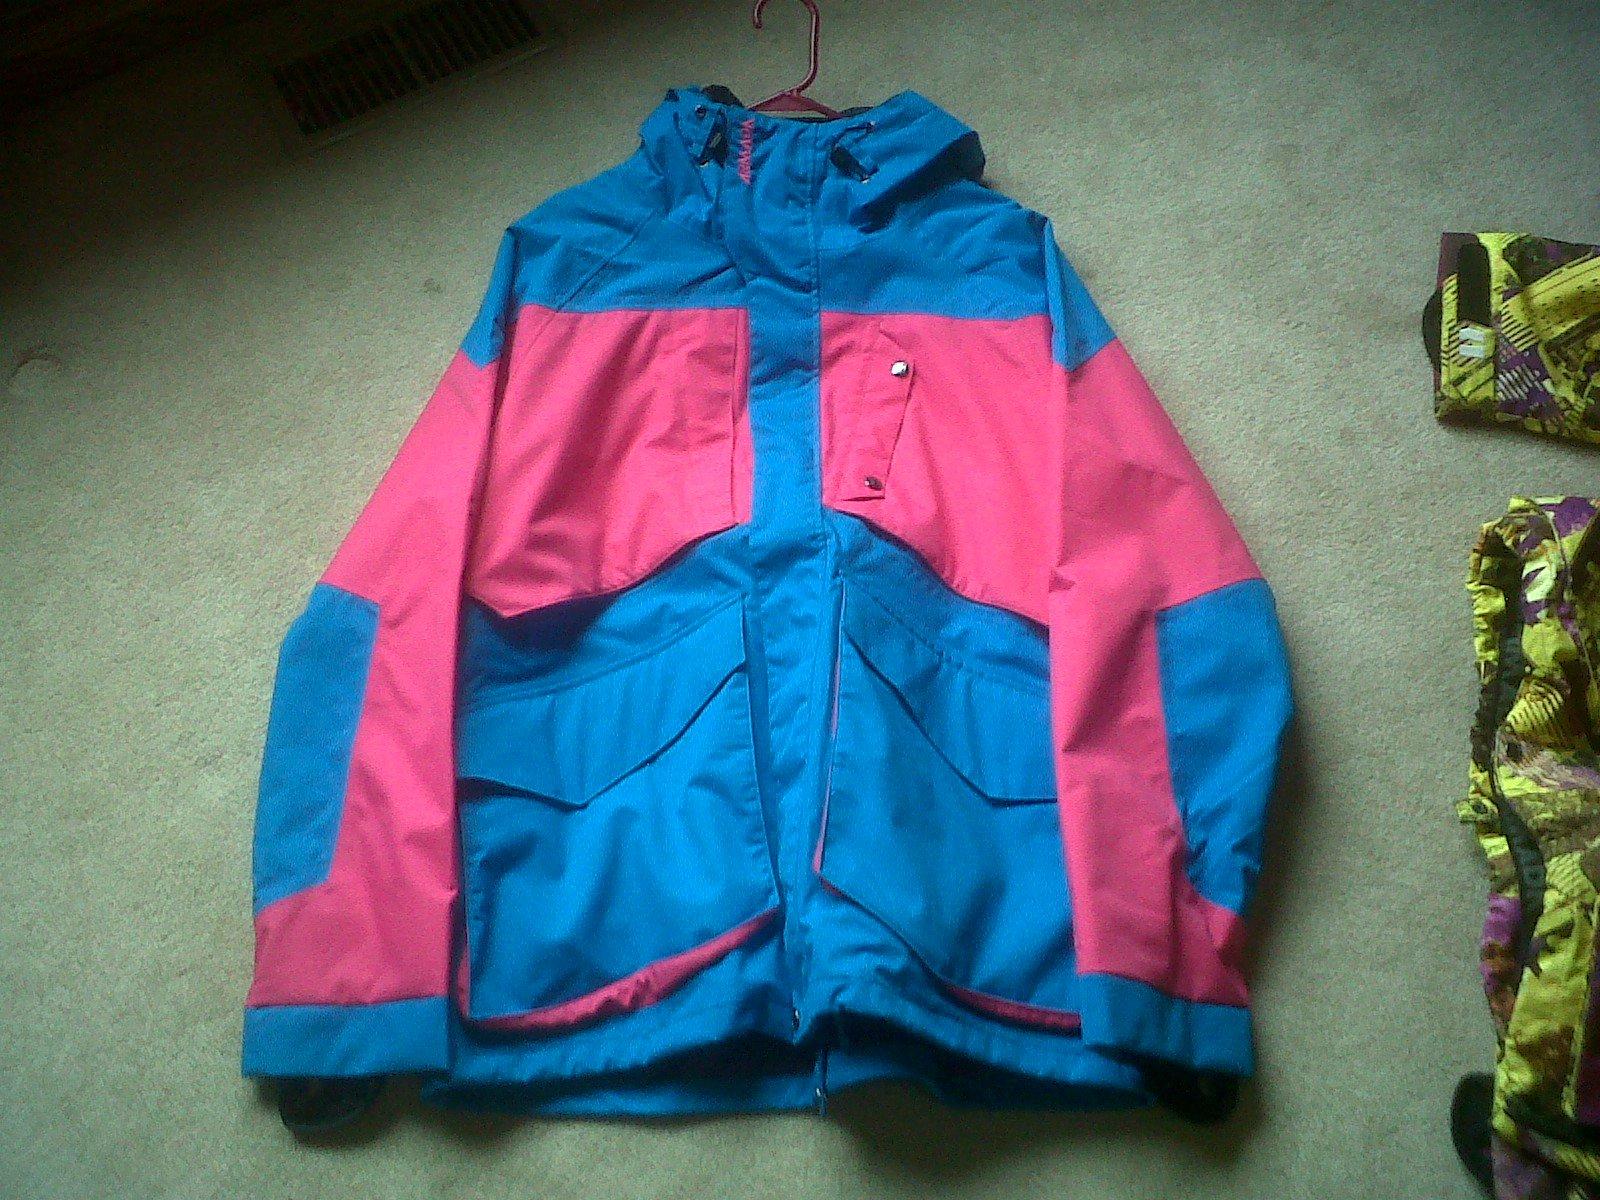 Armada jacket for sale, check thread